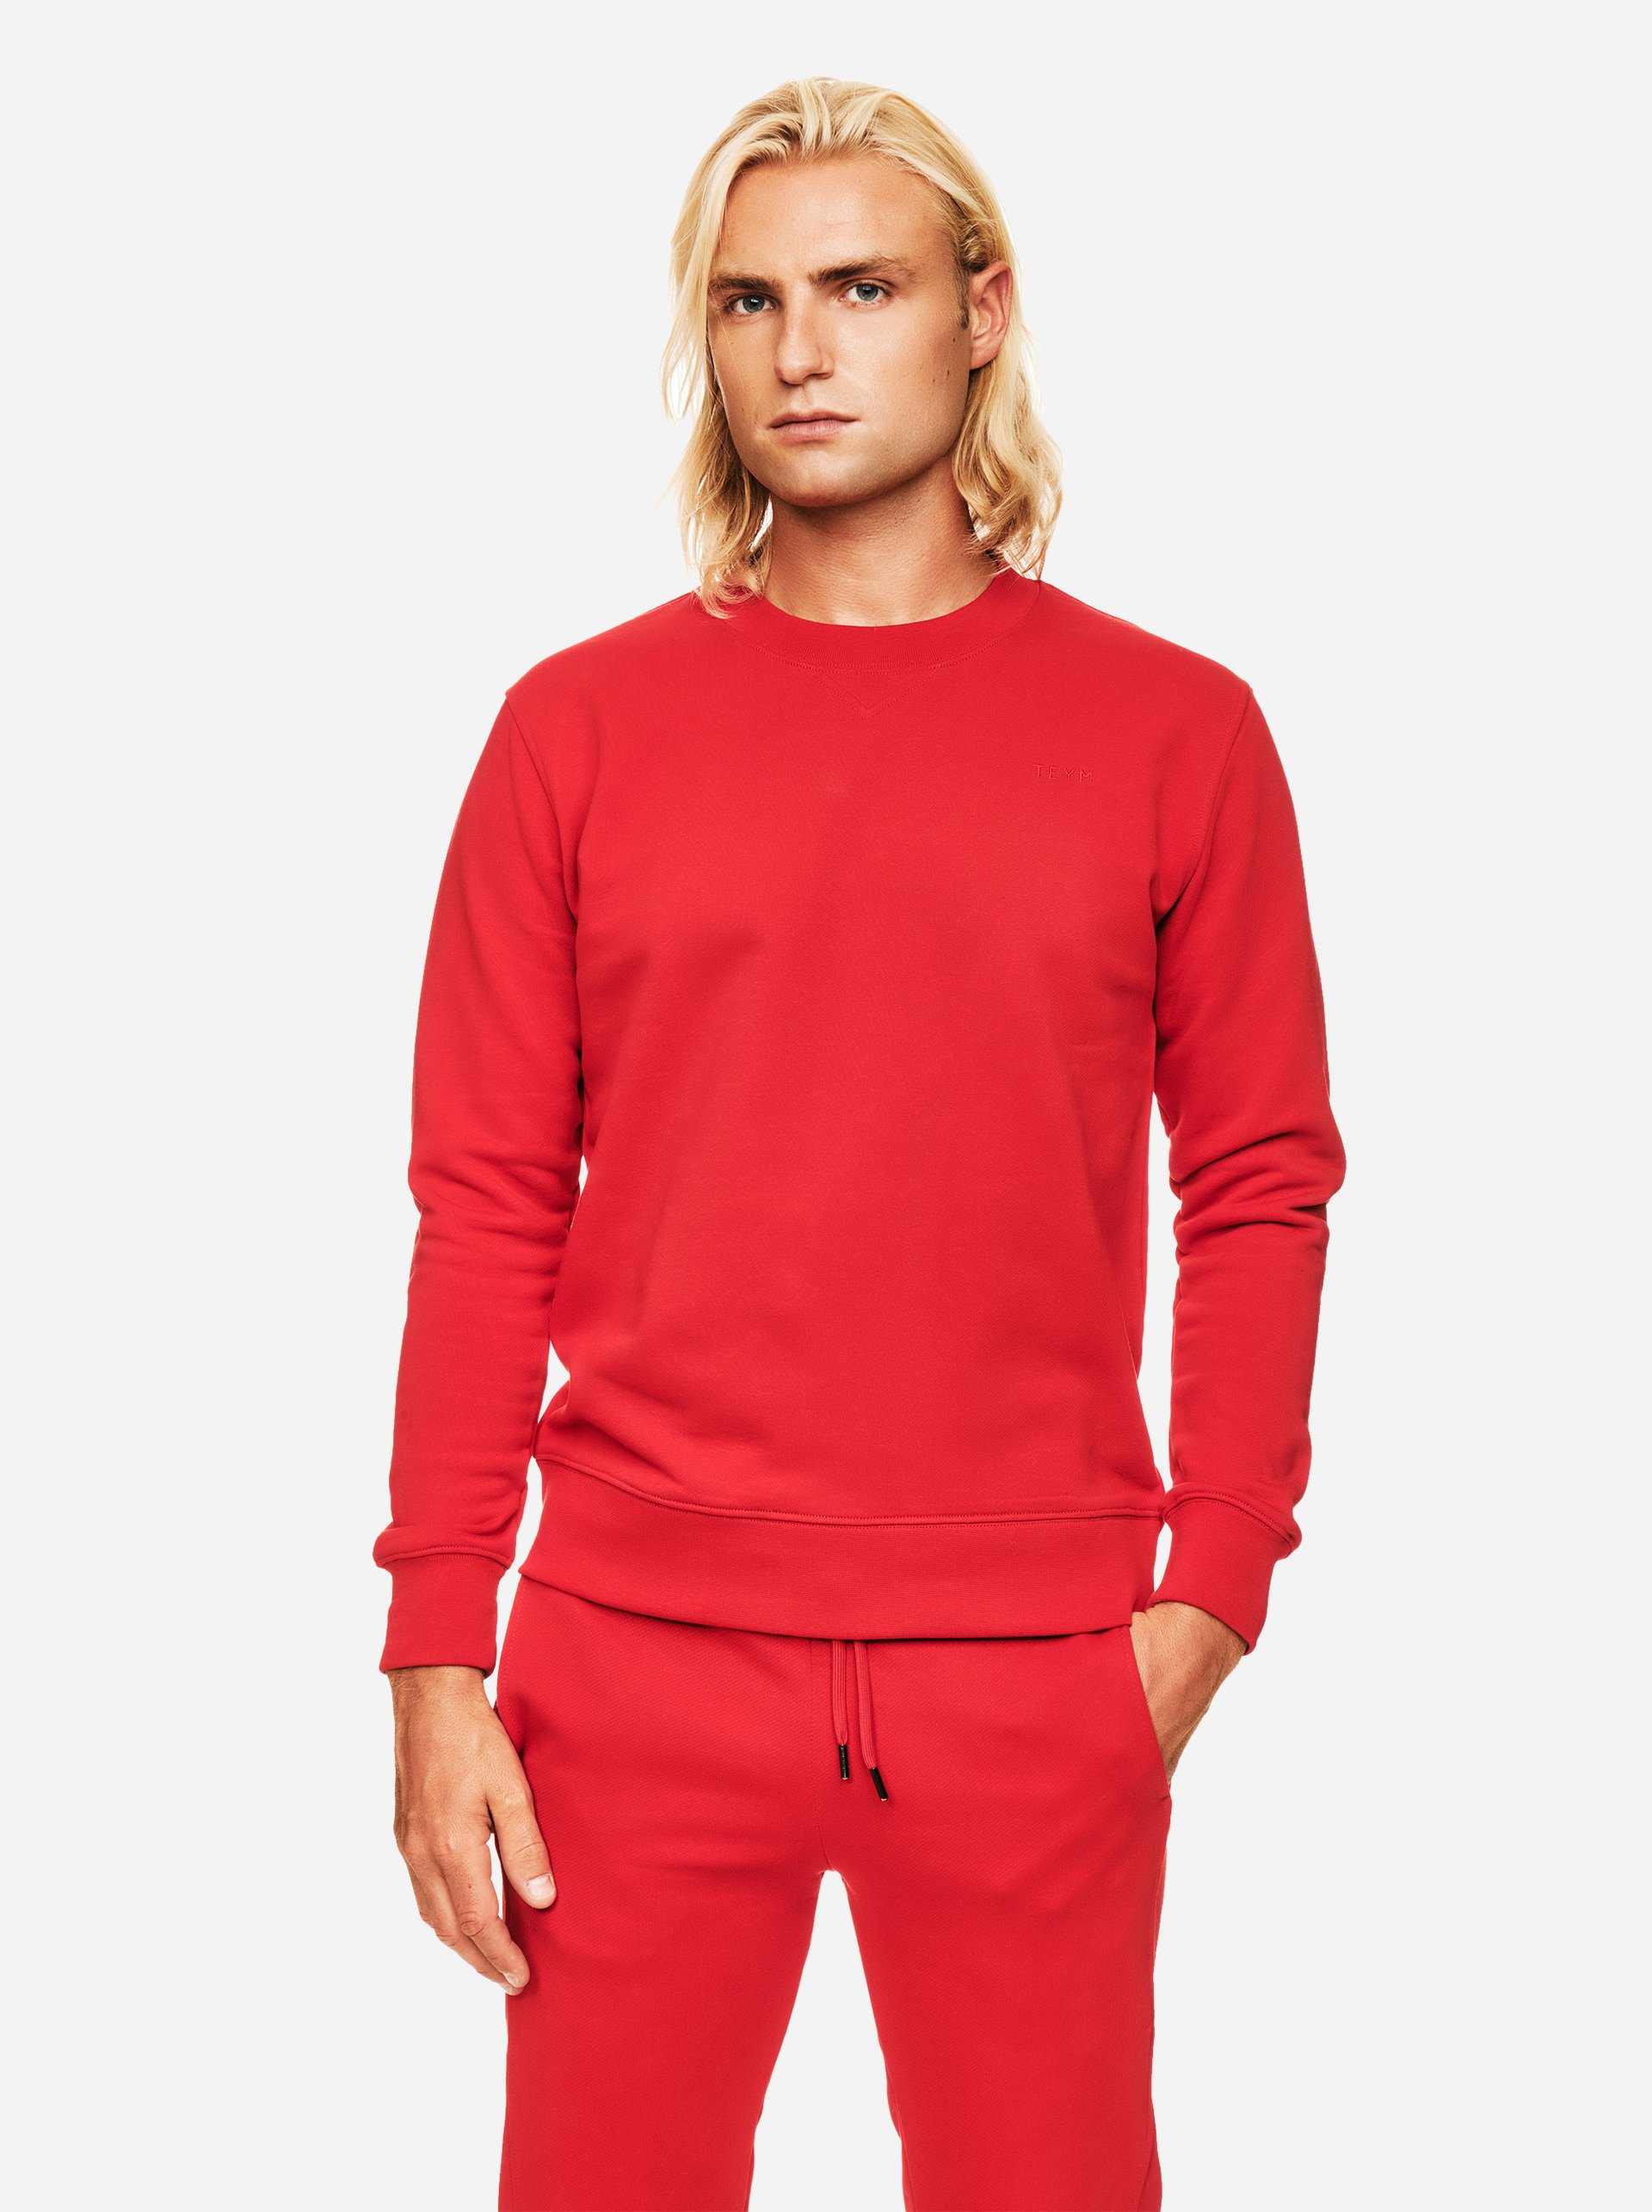 Teym-TheSweatshirt-Men-Red01